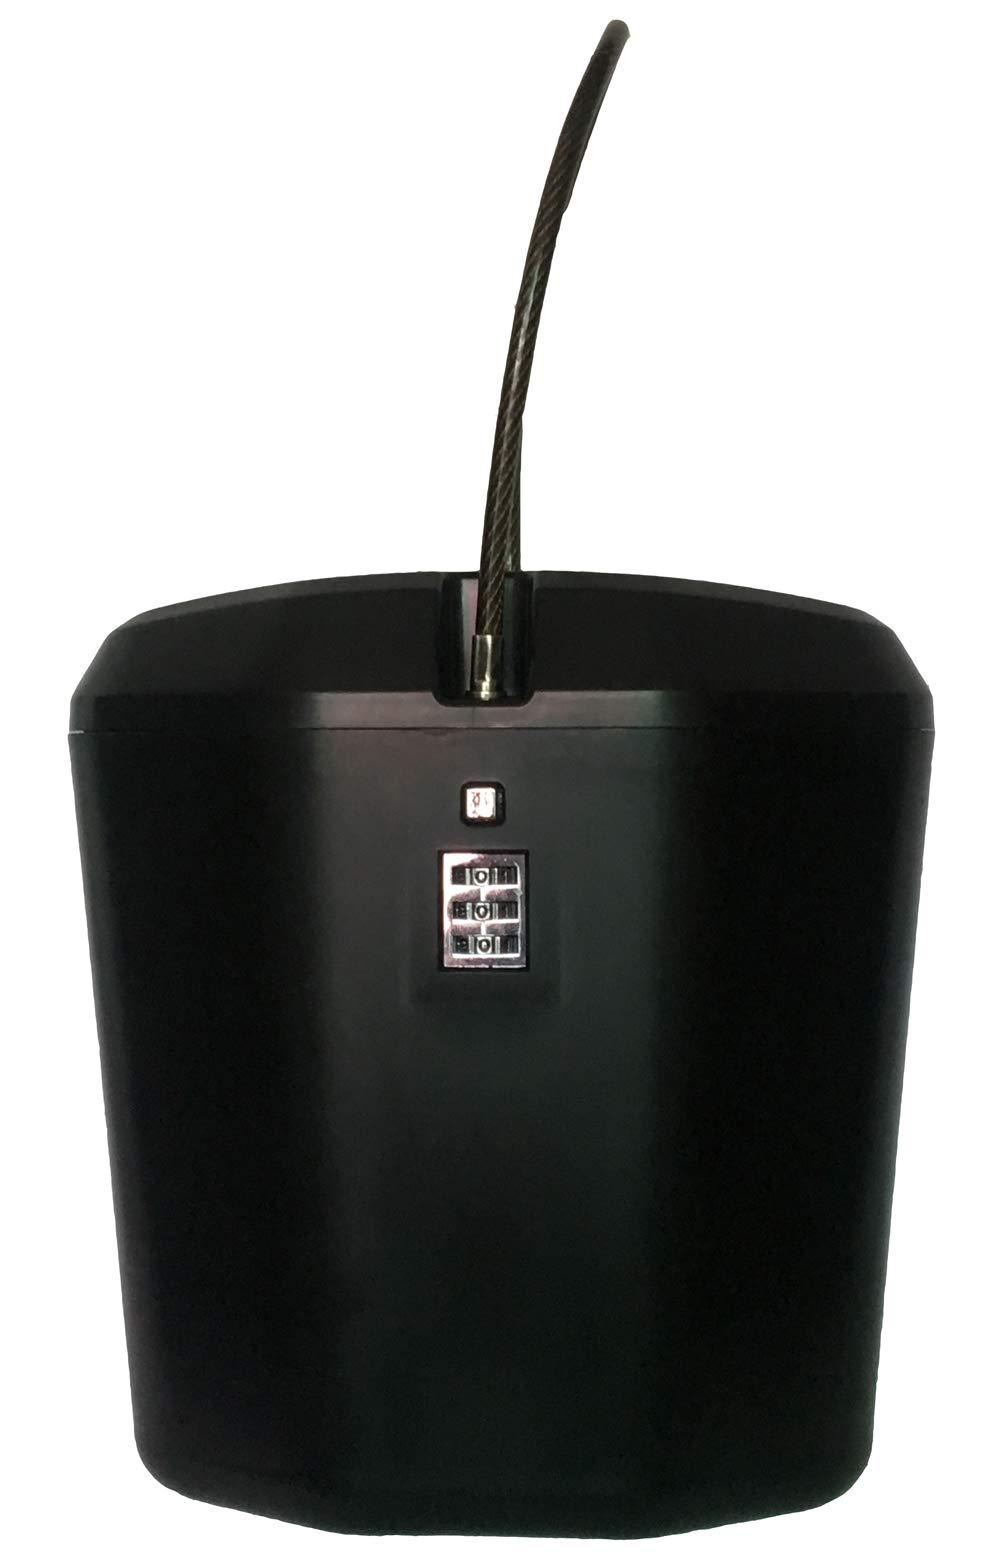 AZ ROB Portable Indoor/Outdoor Heavy-Duty Flexible Steel Cable Password Lock Box Safe,Keyless, one Key Password Setting (Black)